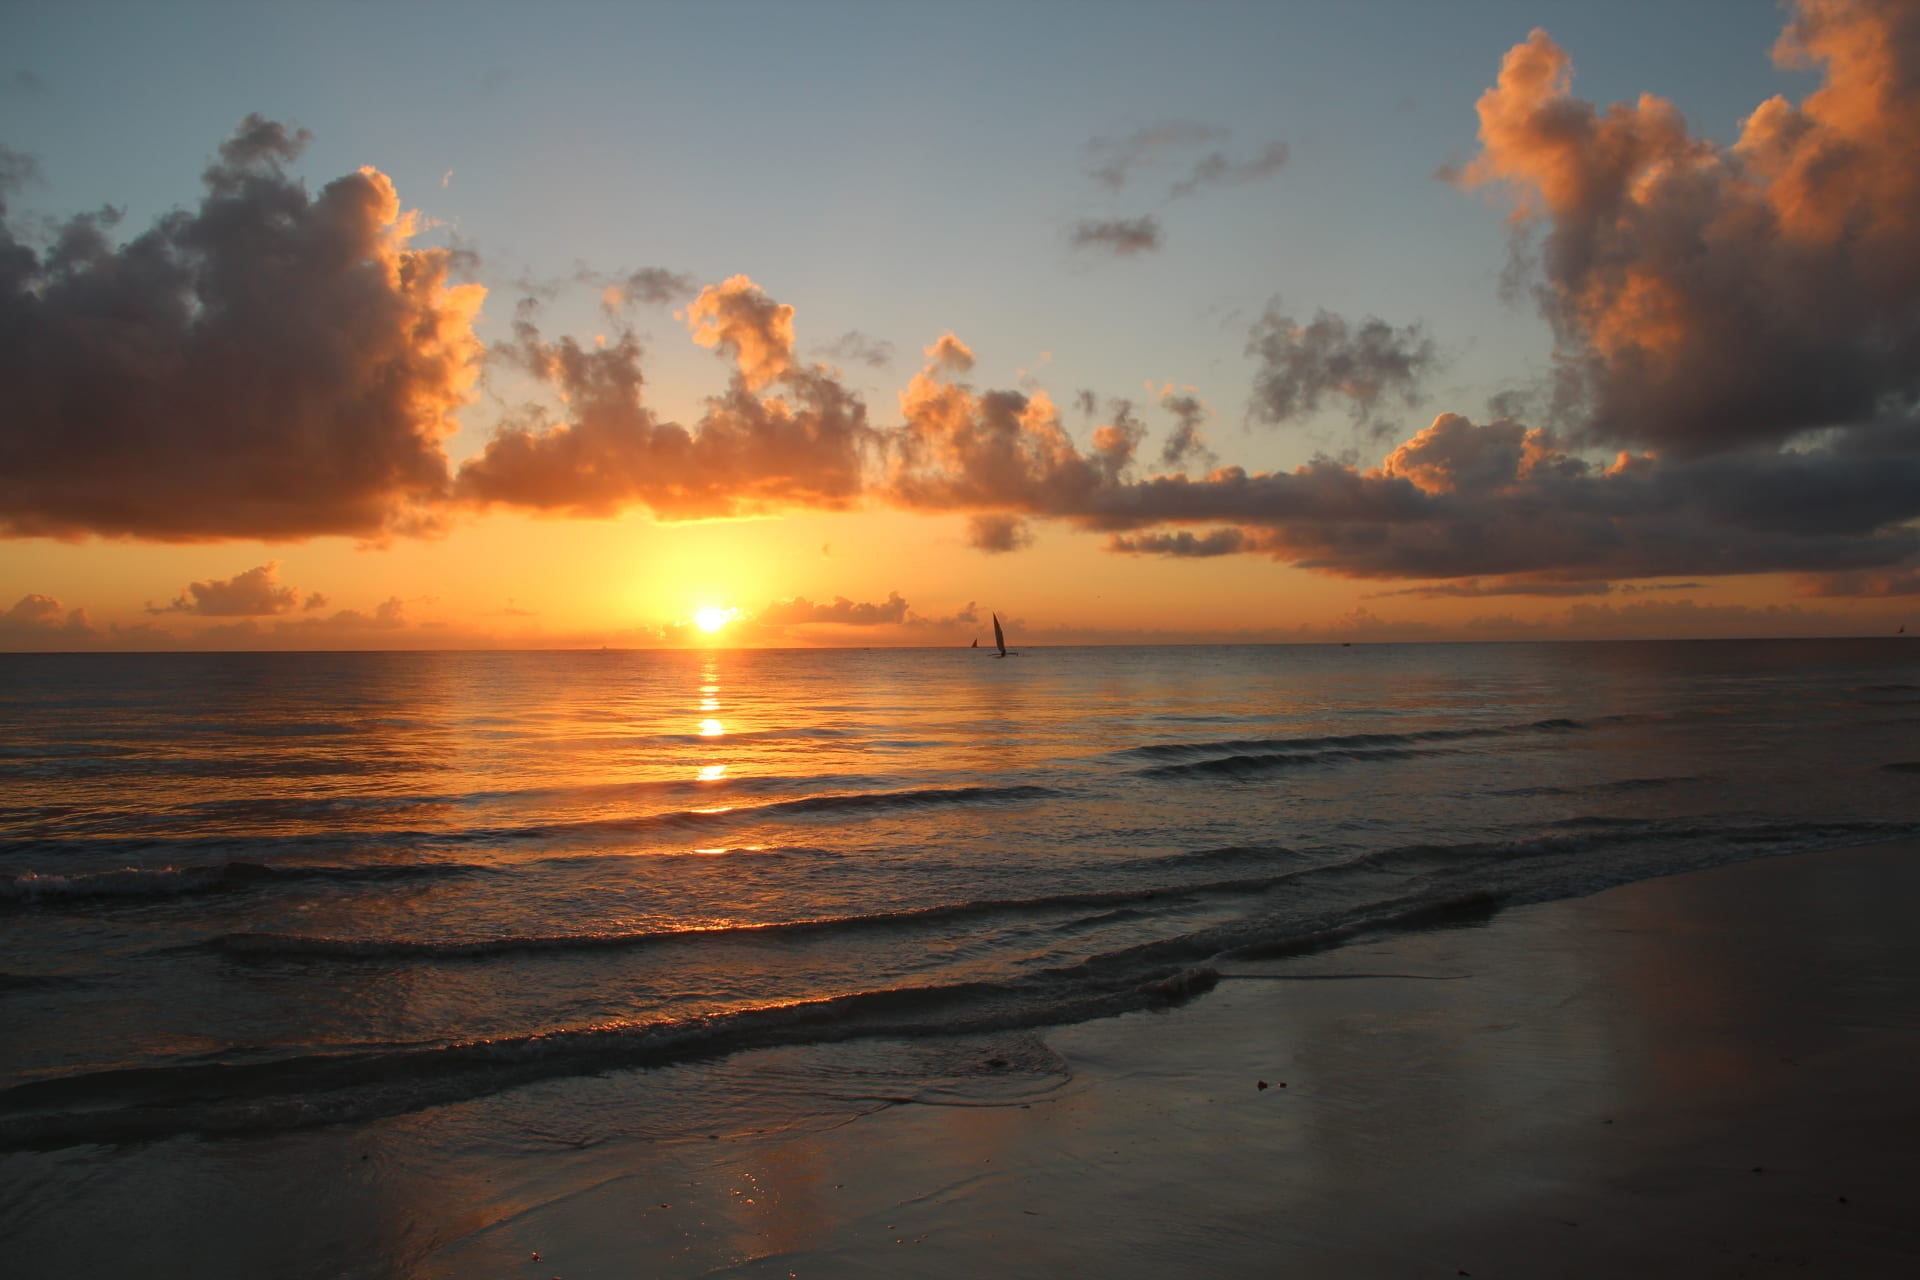 Kilifi - Sand, sea, and sunset on the Kenyan coast - a Kilifi sunset